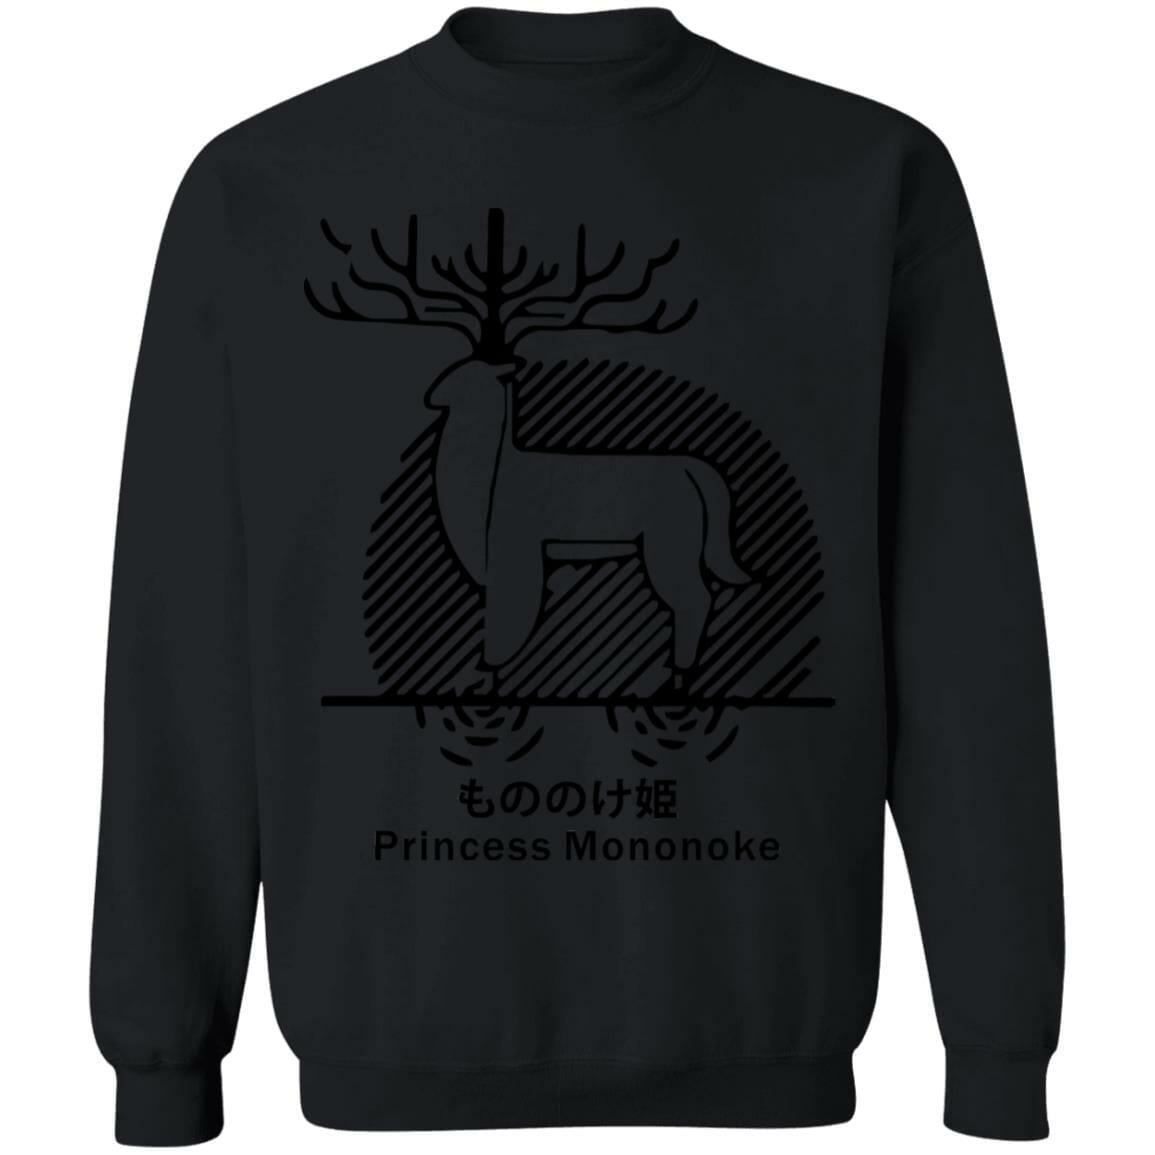 Princess Mononoke – Shishigami Line Art Sweatshirt Unisex